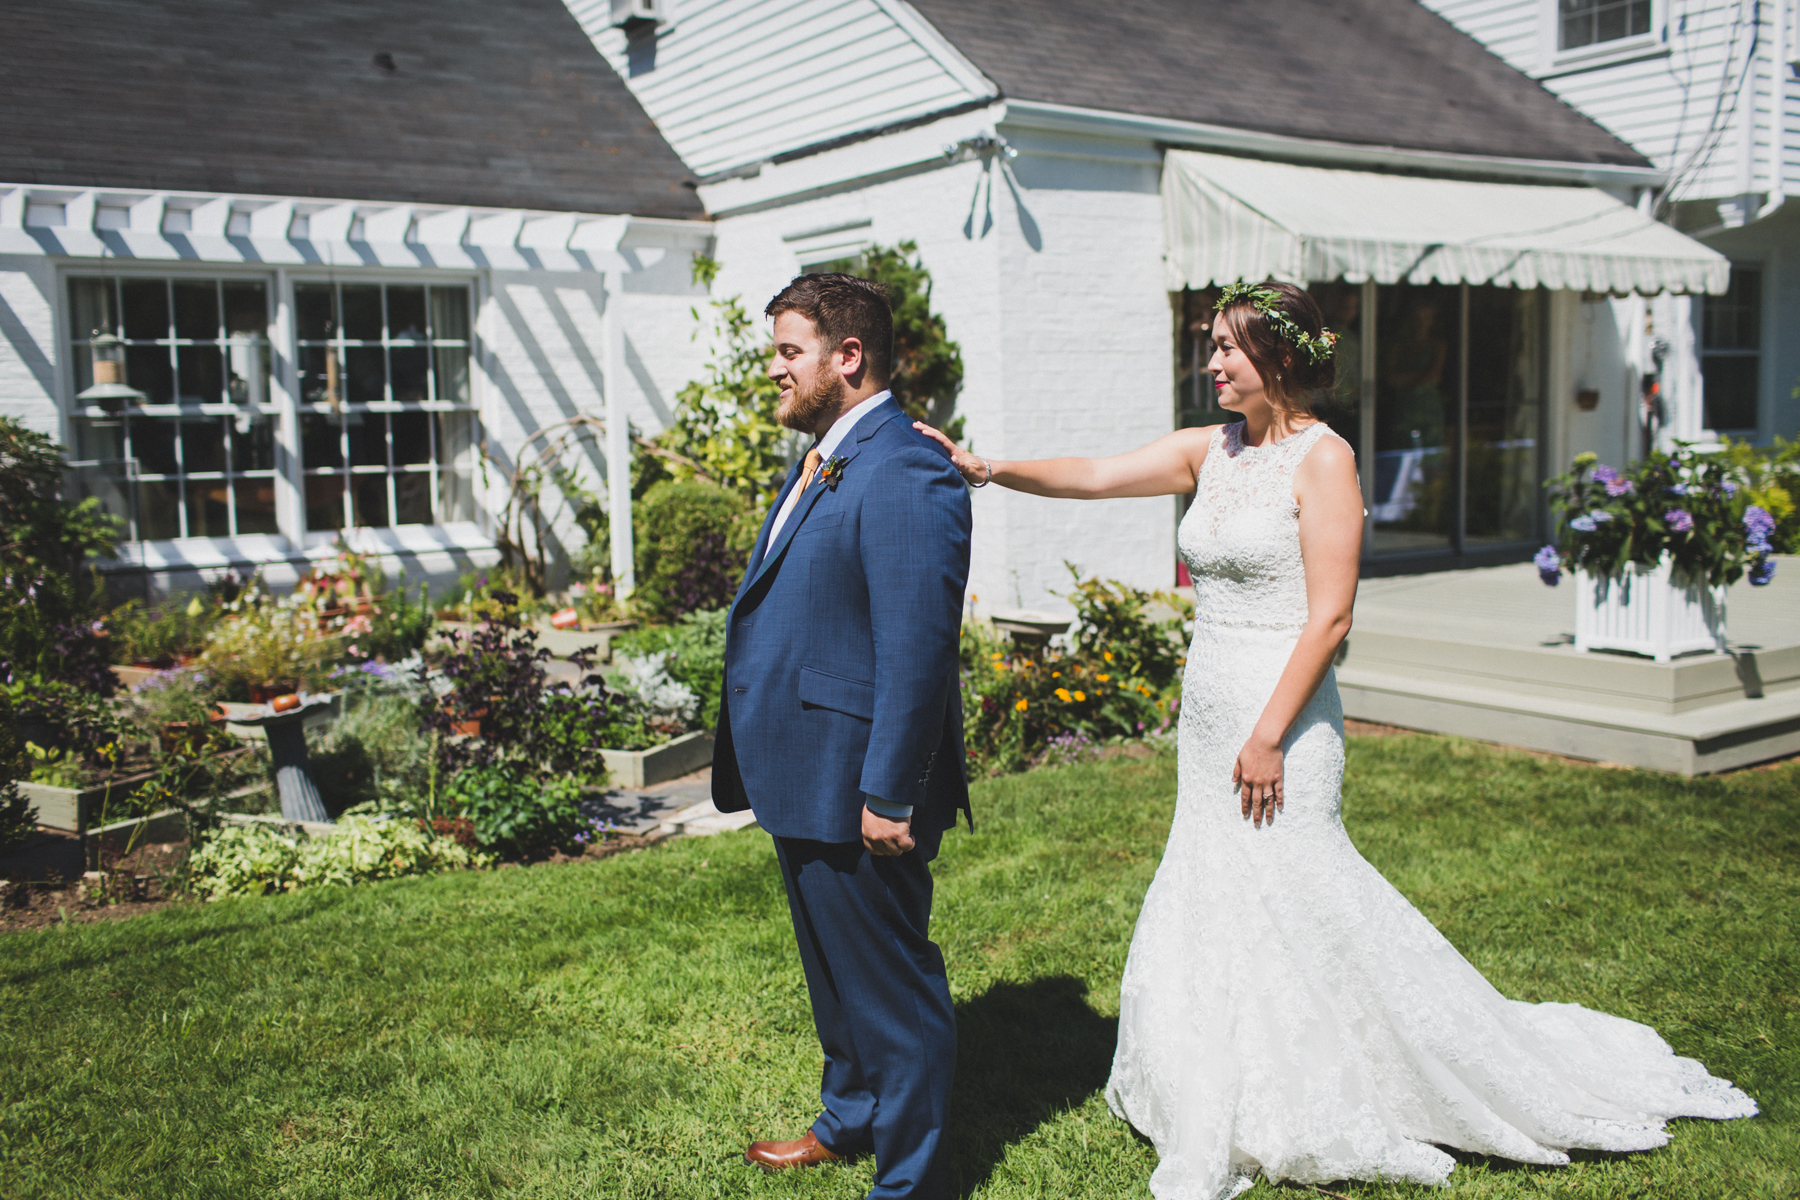 Long-Island-Documentary-Wedding-Photography-Summer-Tent-Wedding-in-New-York-19.jpg